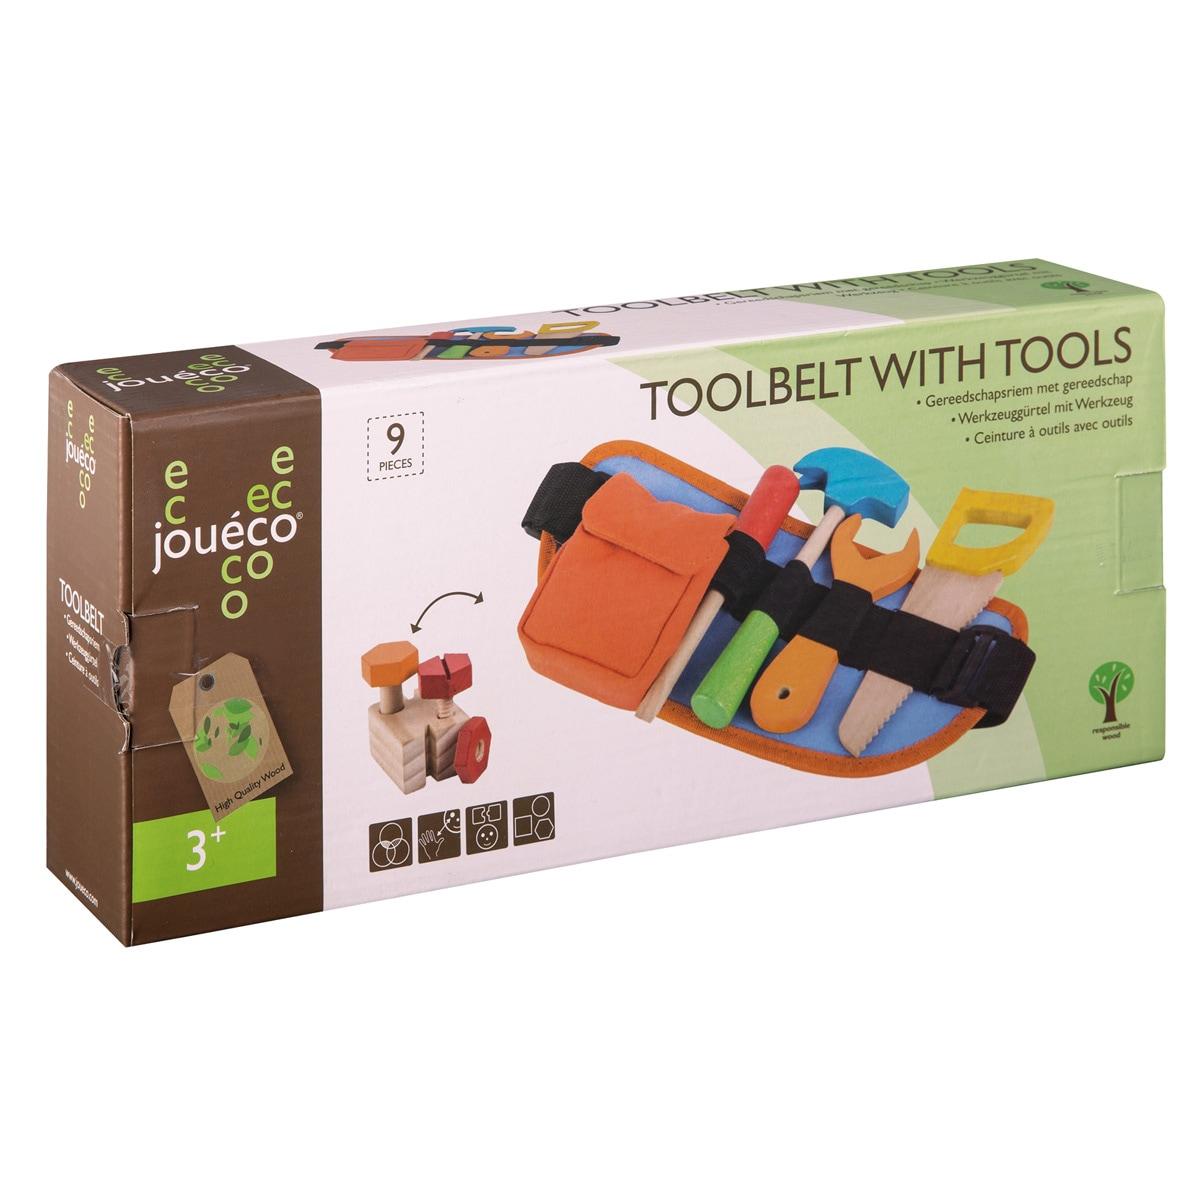 Toolbelt - Παιδική ζώνη με εργαλεία - 80022